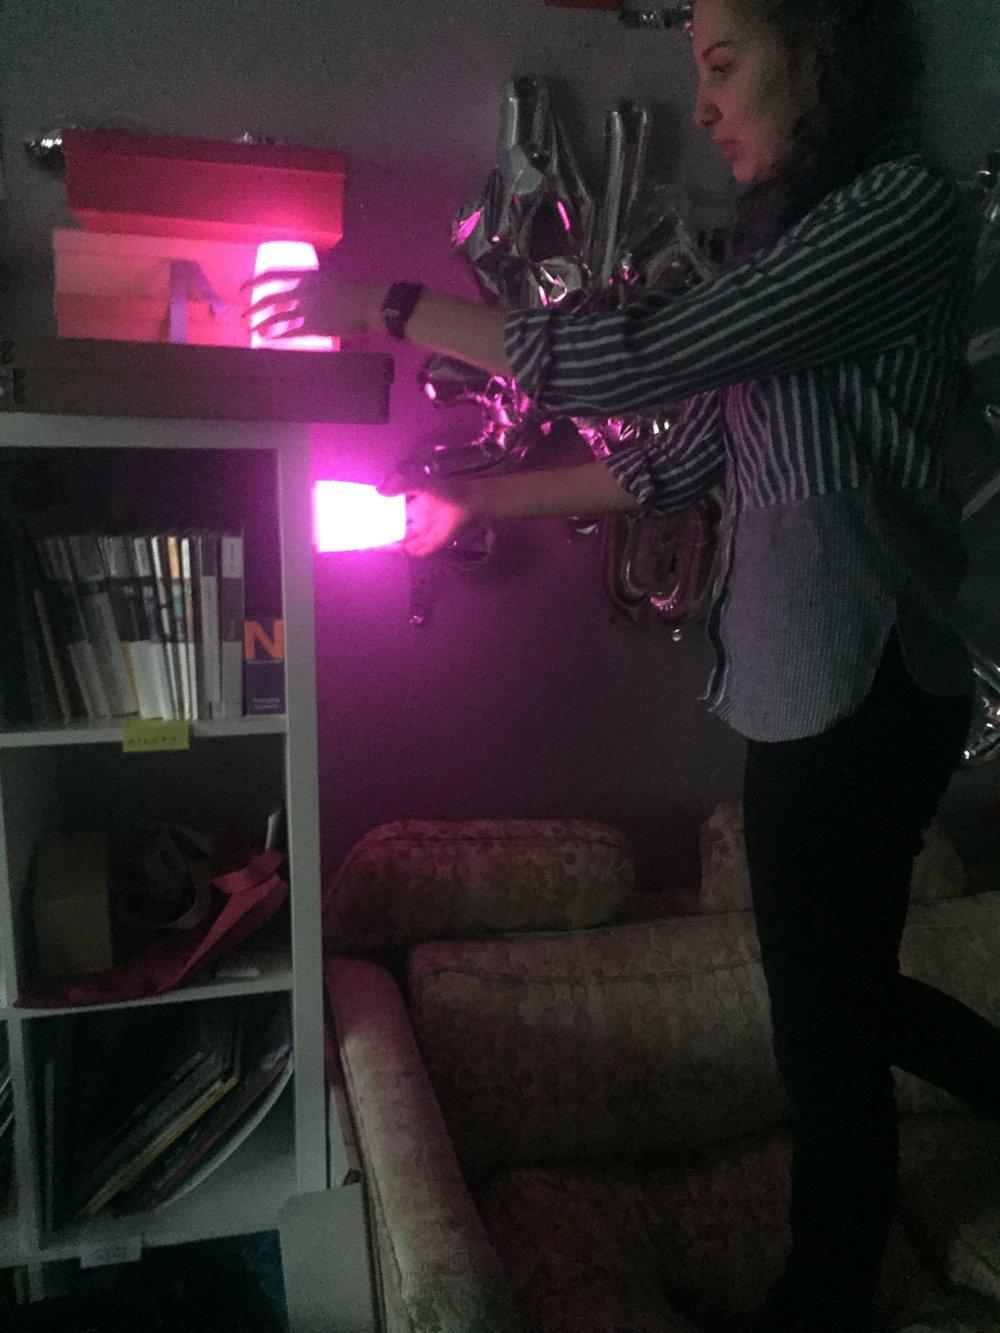 Prototyping with classmate Maryana Kuznetsova